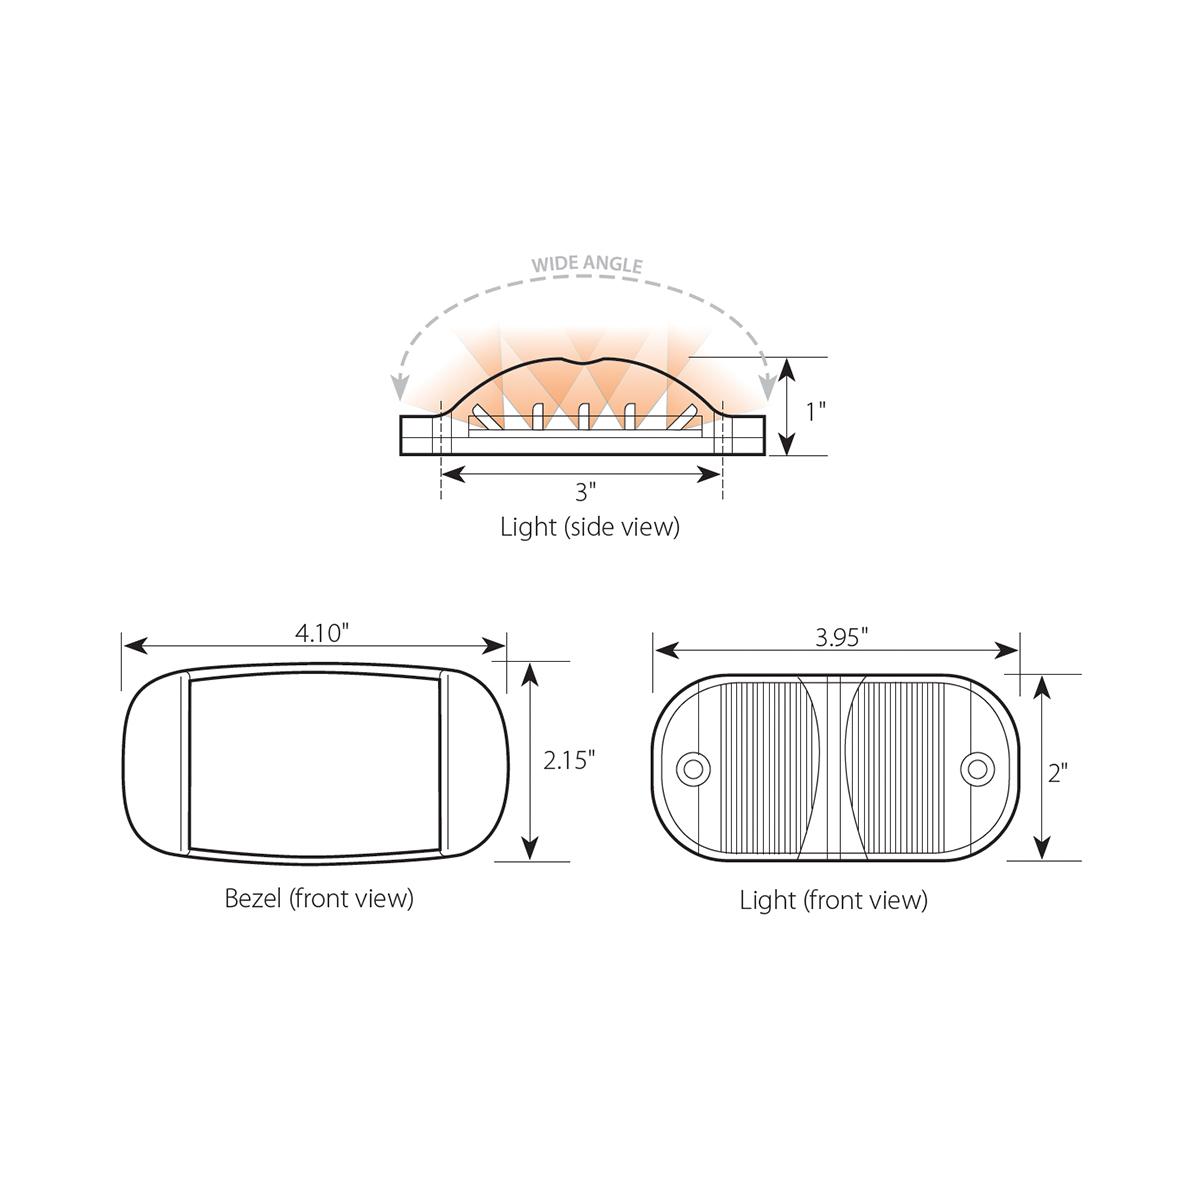 Rectangular Camel Back Wide Angle Dual Function LED Light